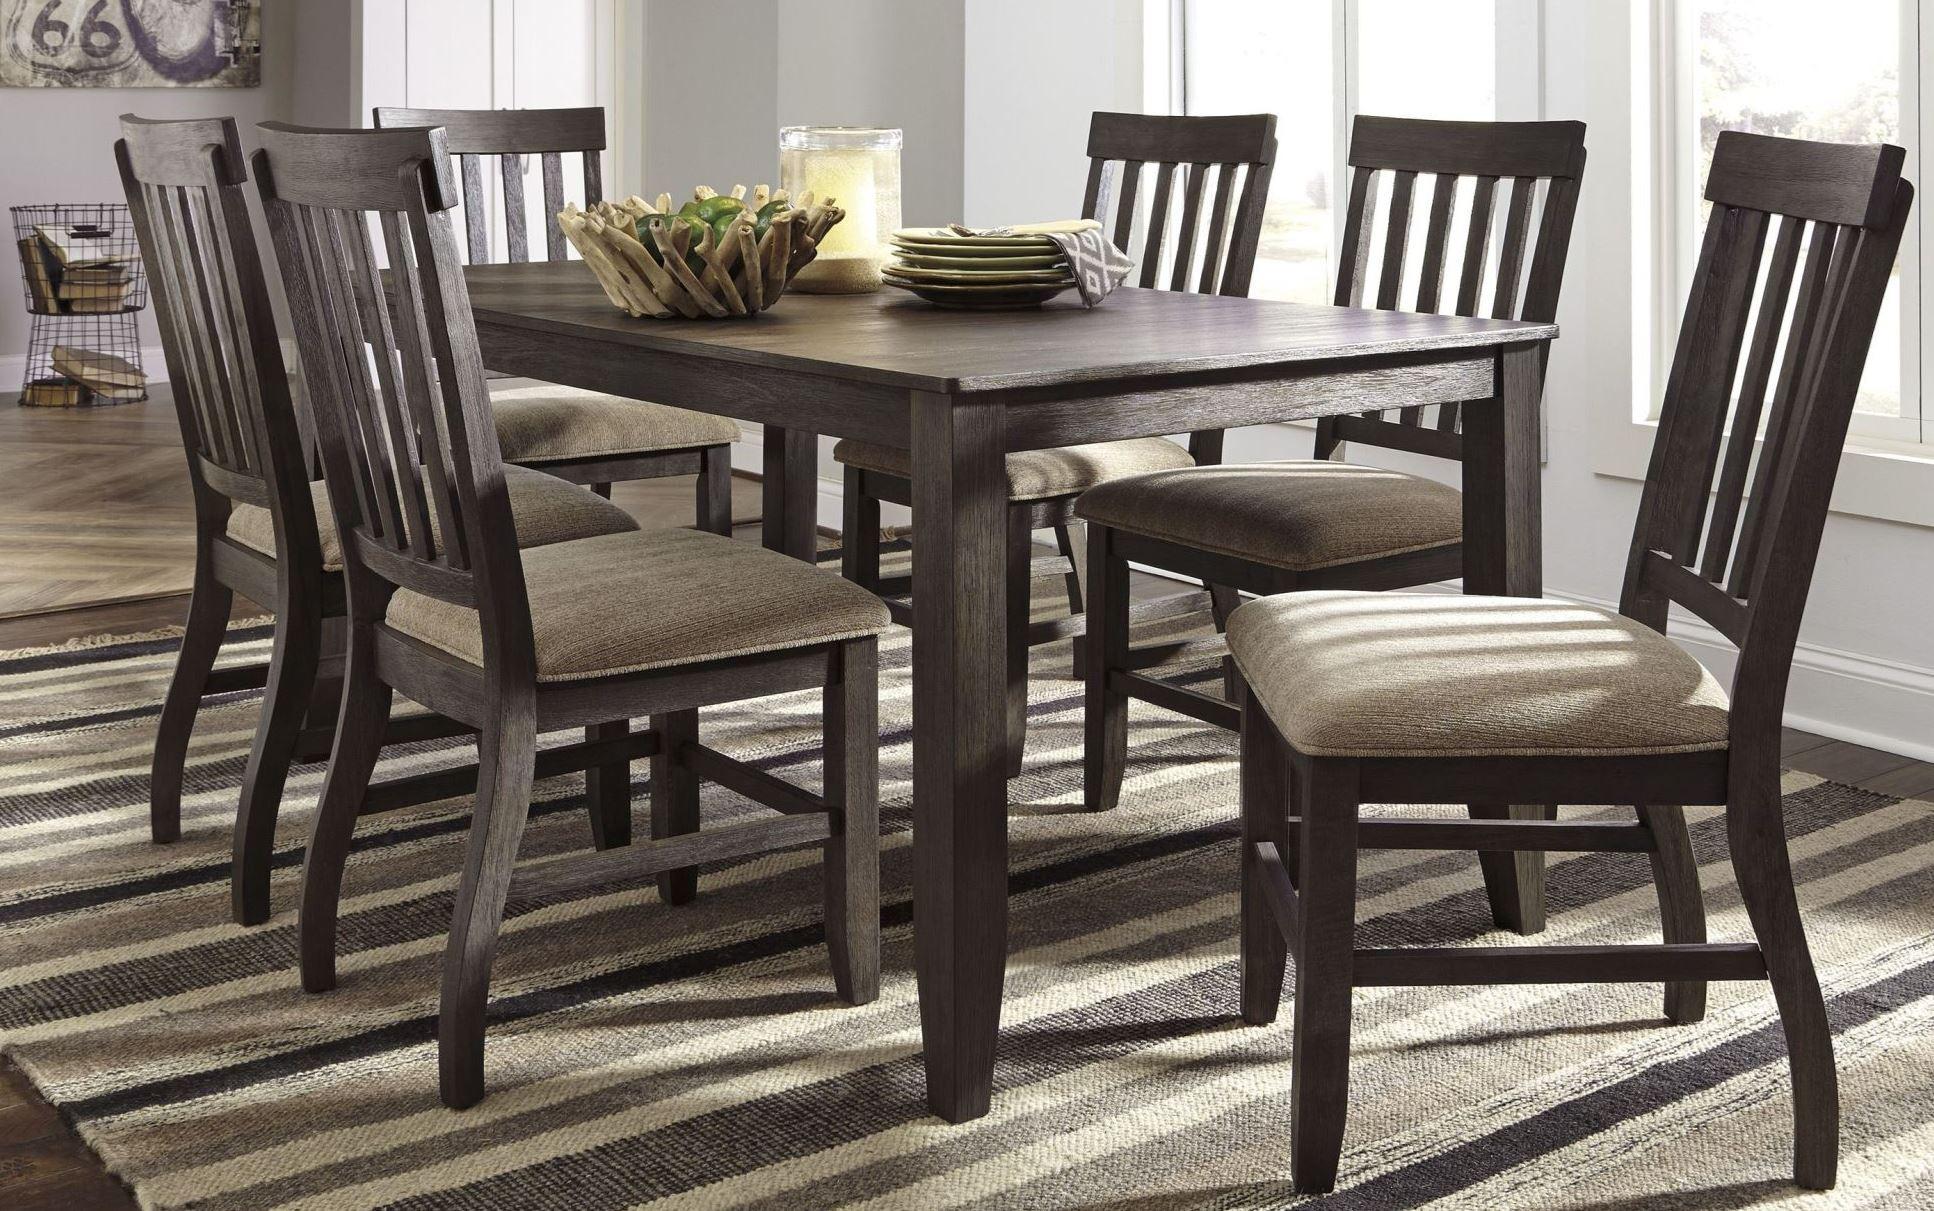 Dresbar Grayish Brown Rectangular Dining Room Set From